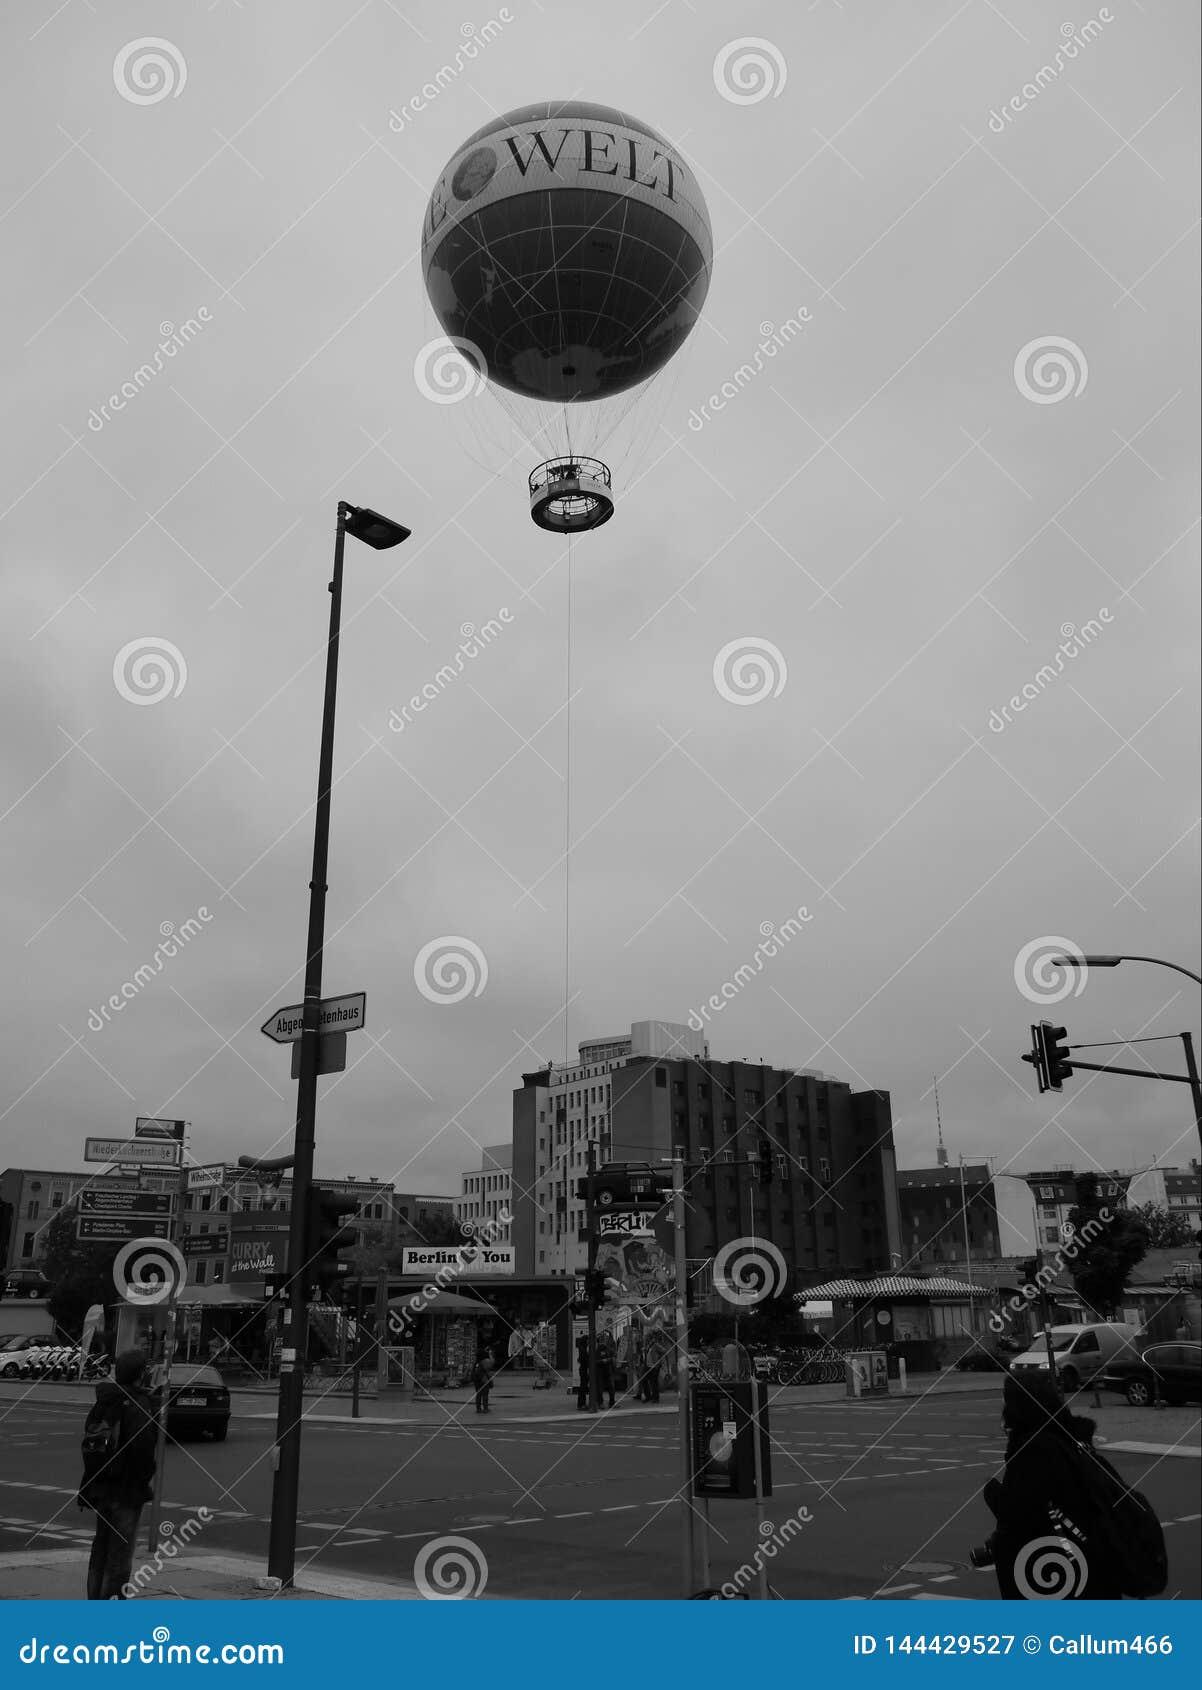 Monochrome ballon tethered to the ground above street